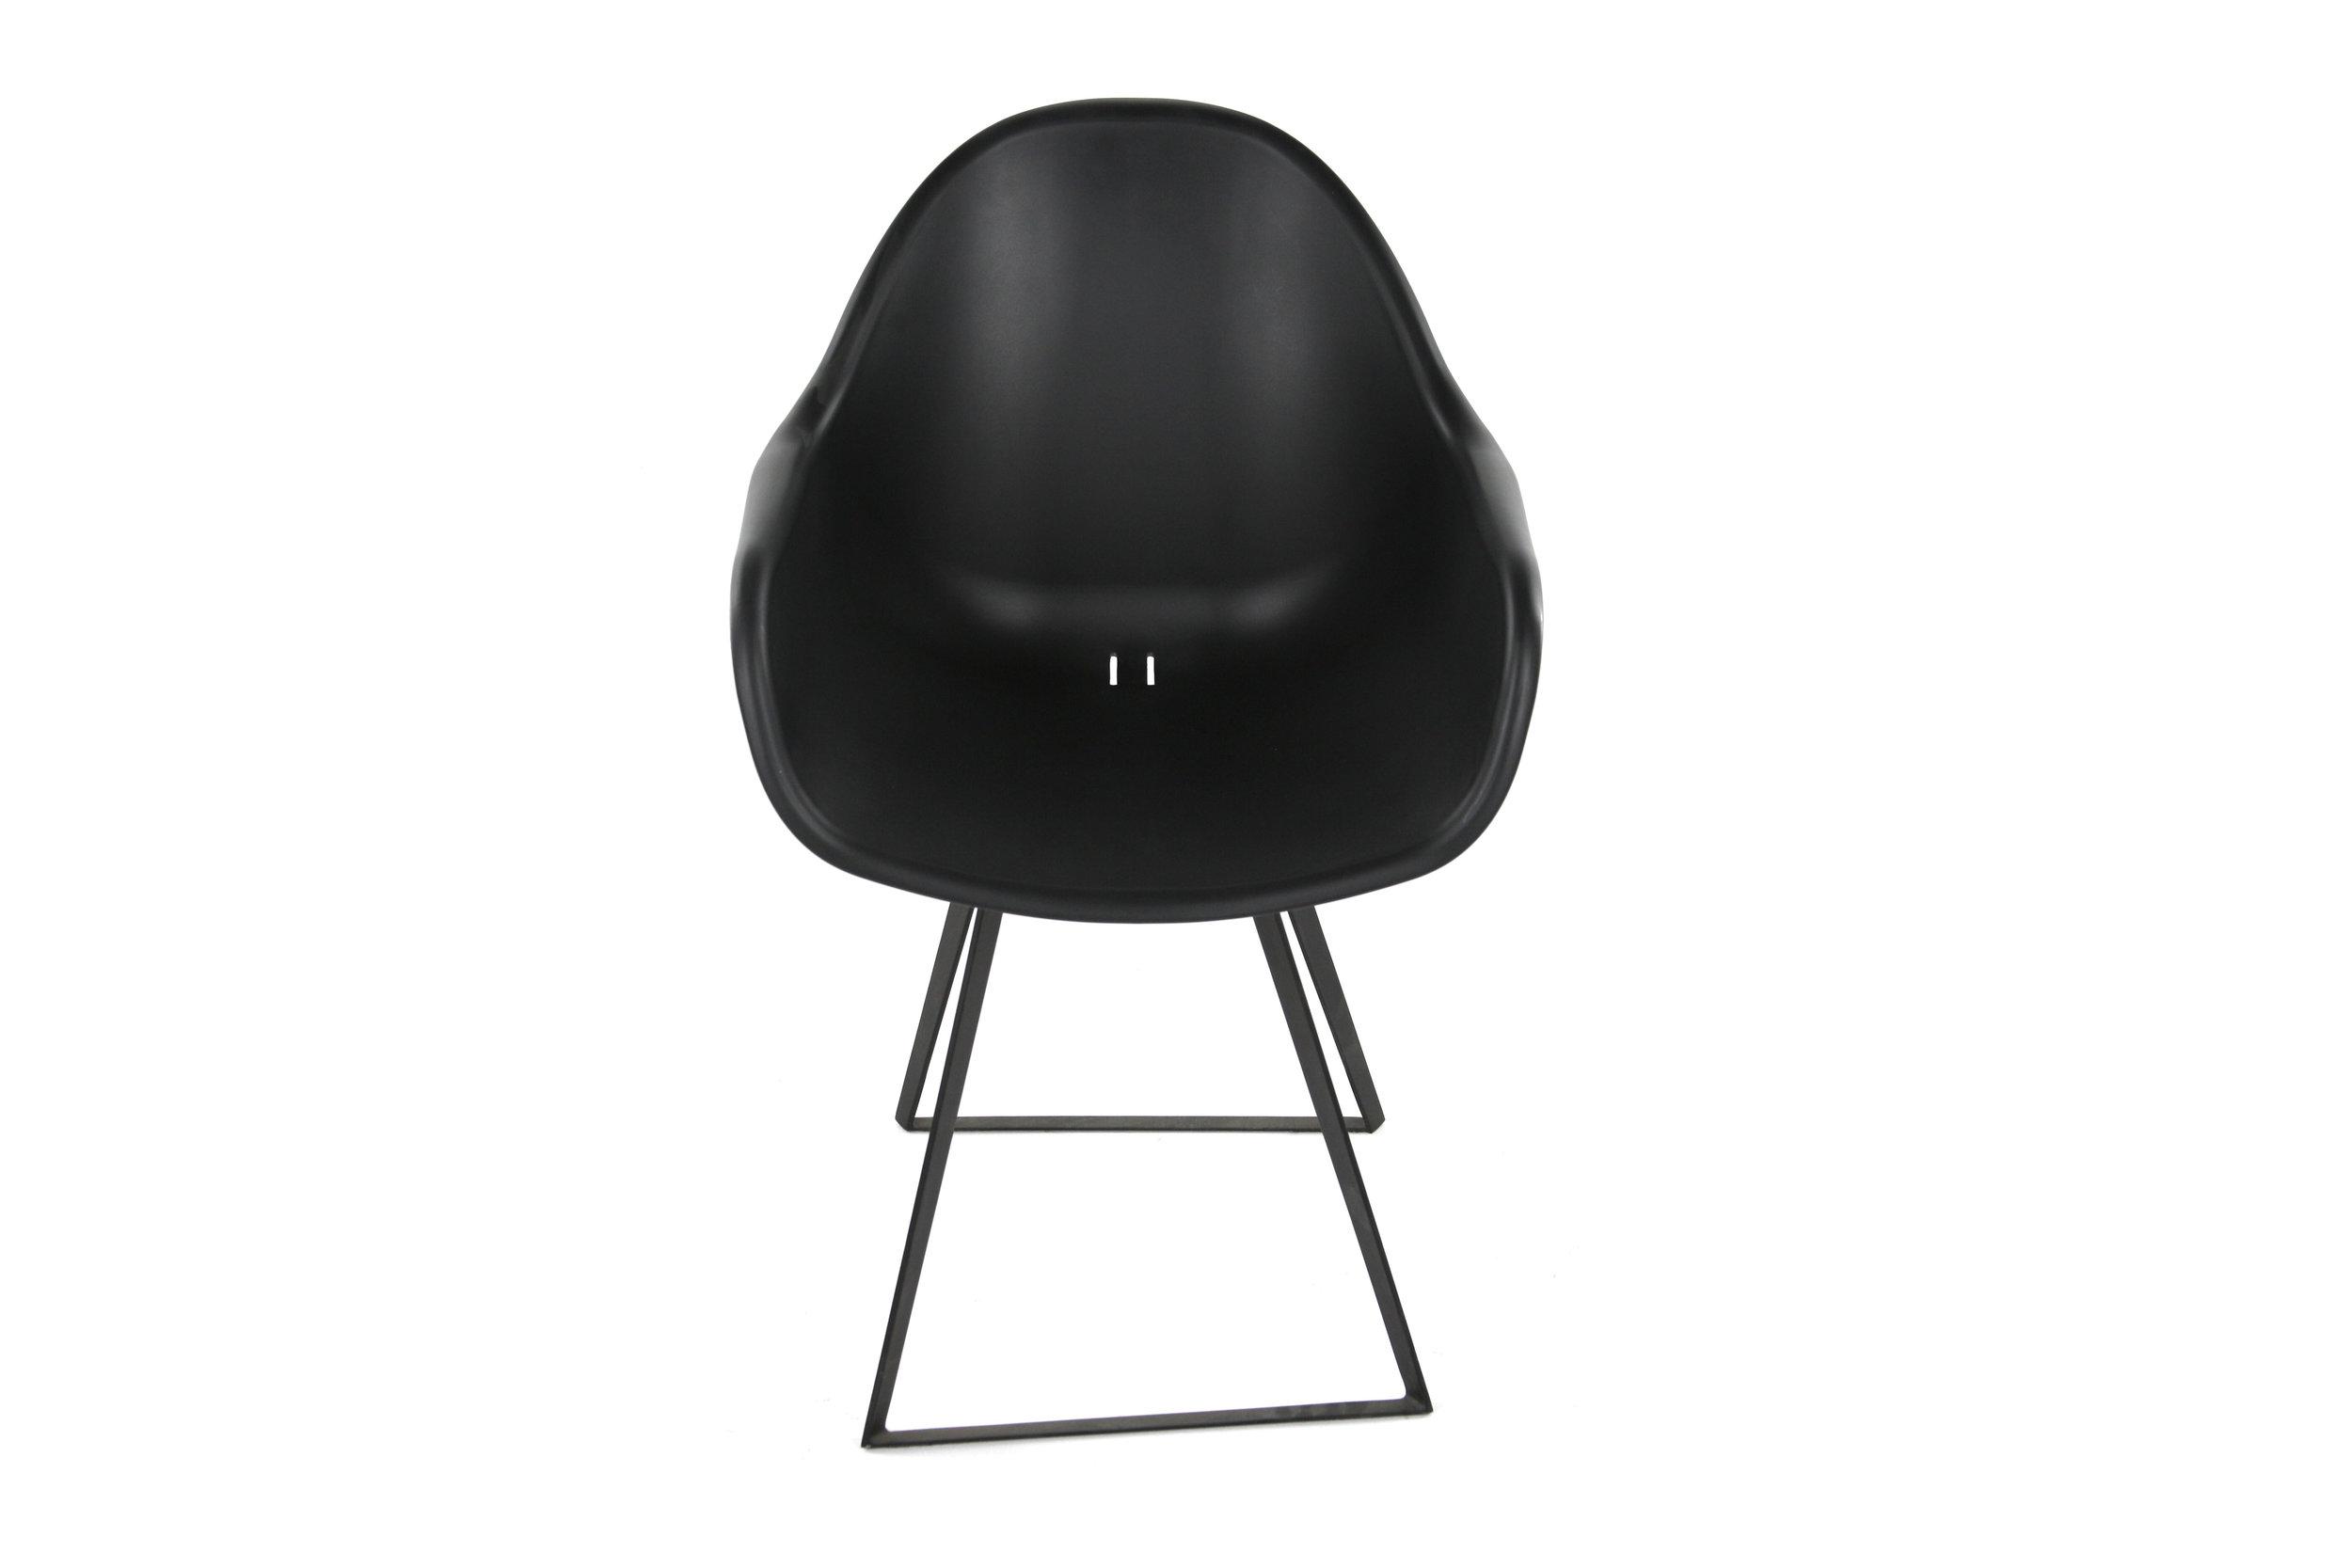 Black Shell Chair 1.jpg